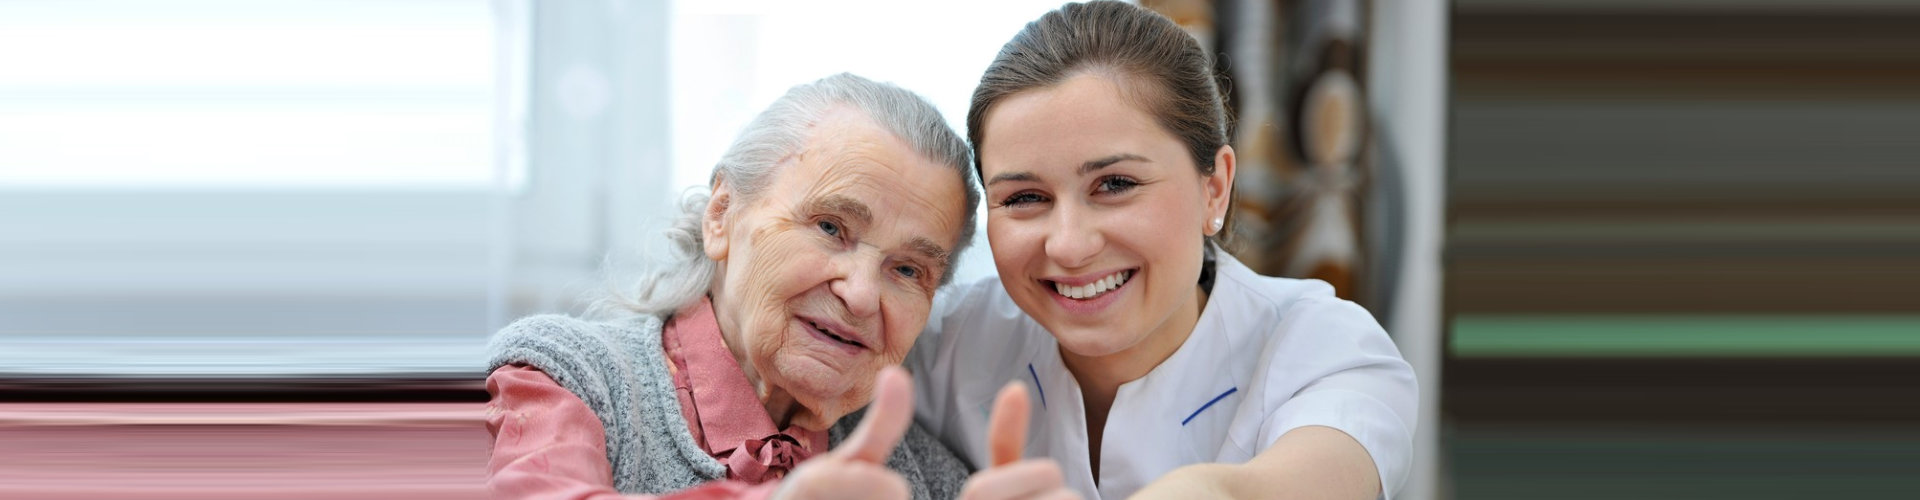 senior woman ang her caregiver